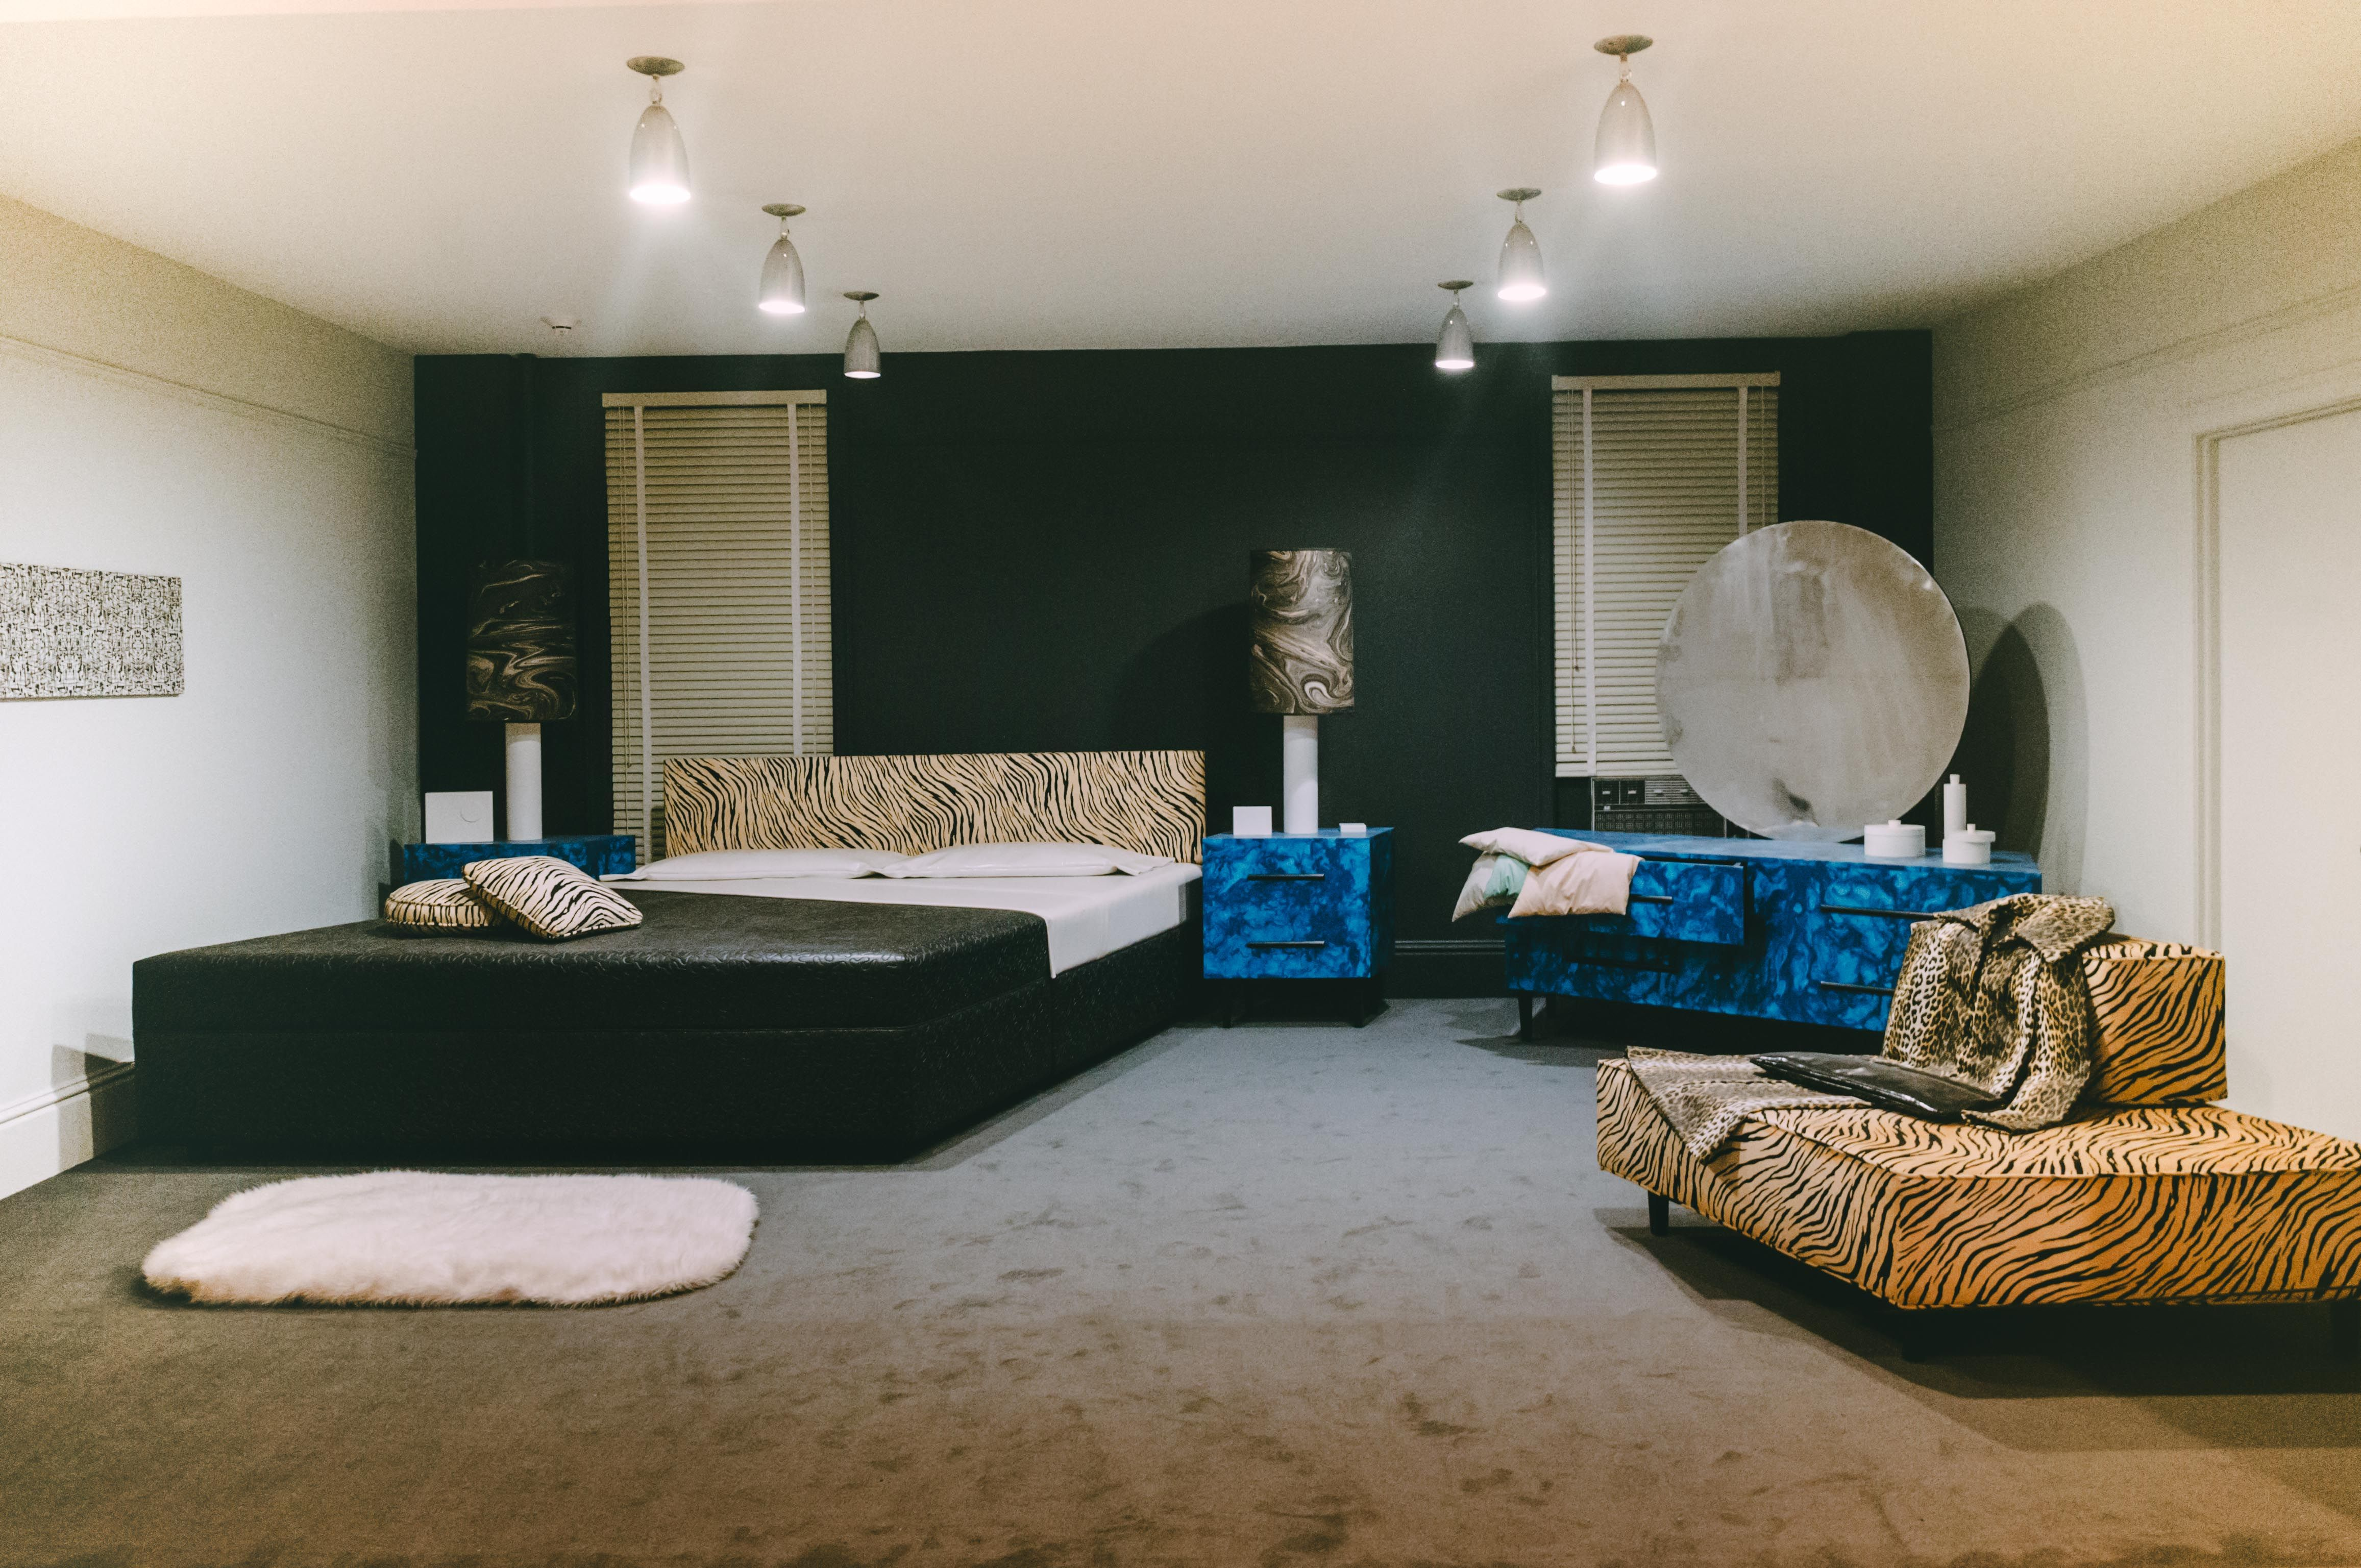 Claes oldenburg bedroom ensemble 1963